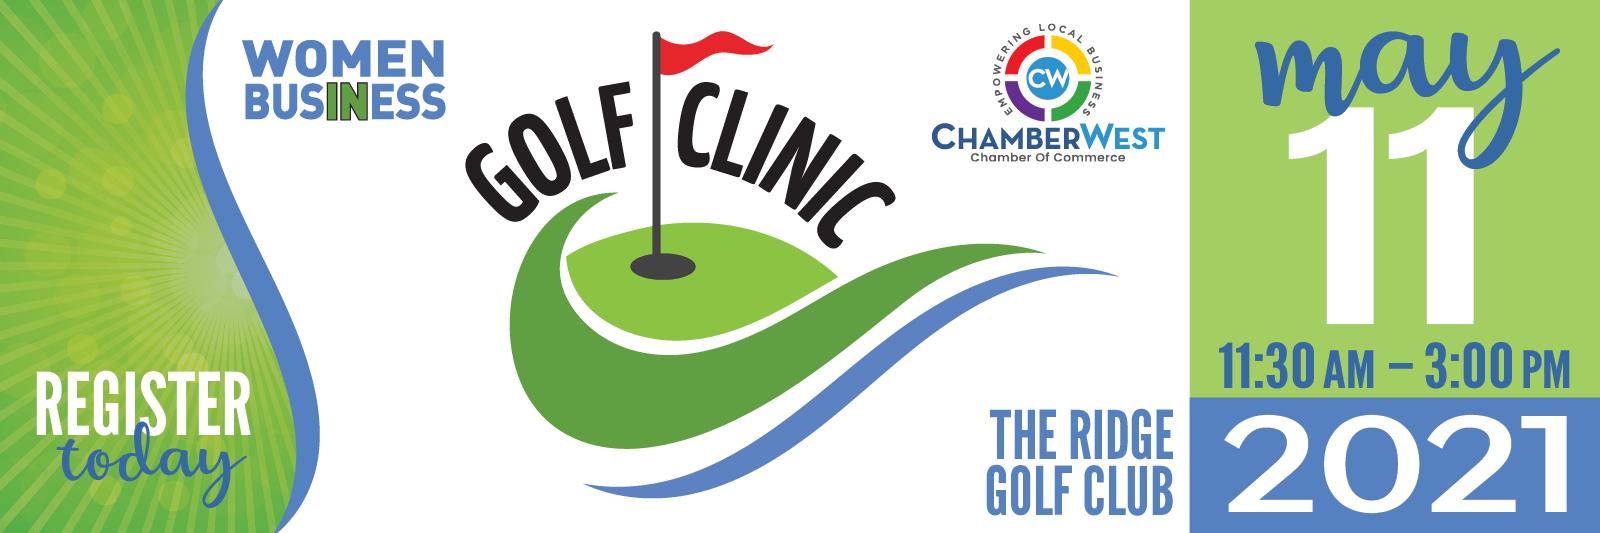 21WIB-golf-clinic-HPheader-1600x533-0521.jpg